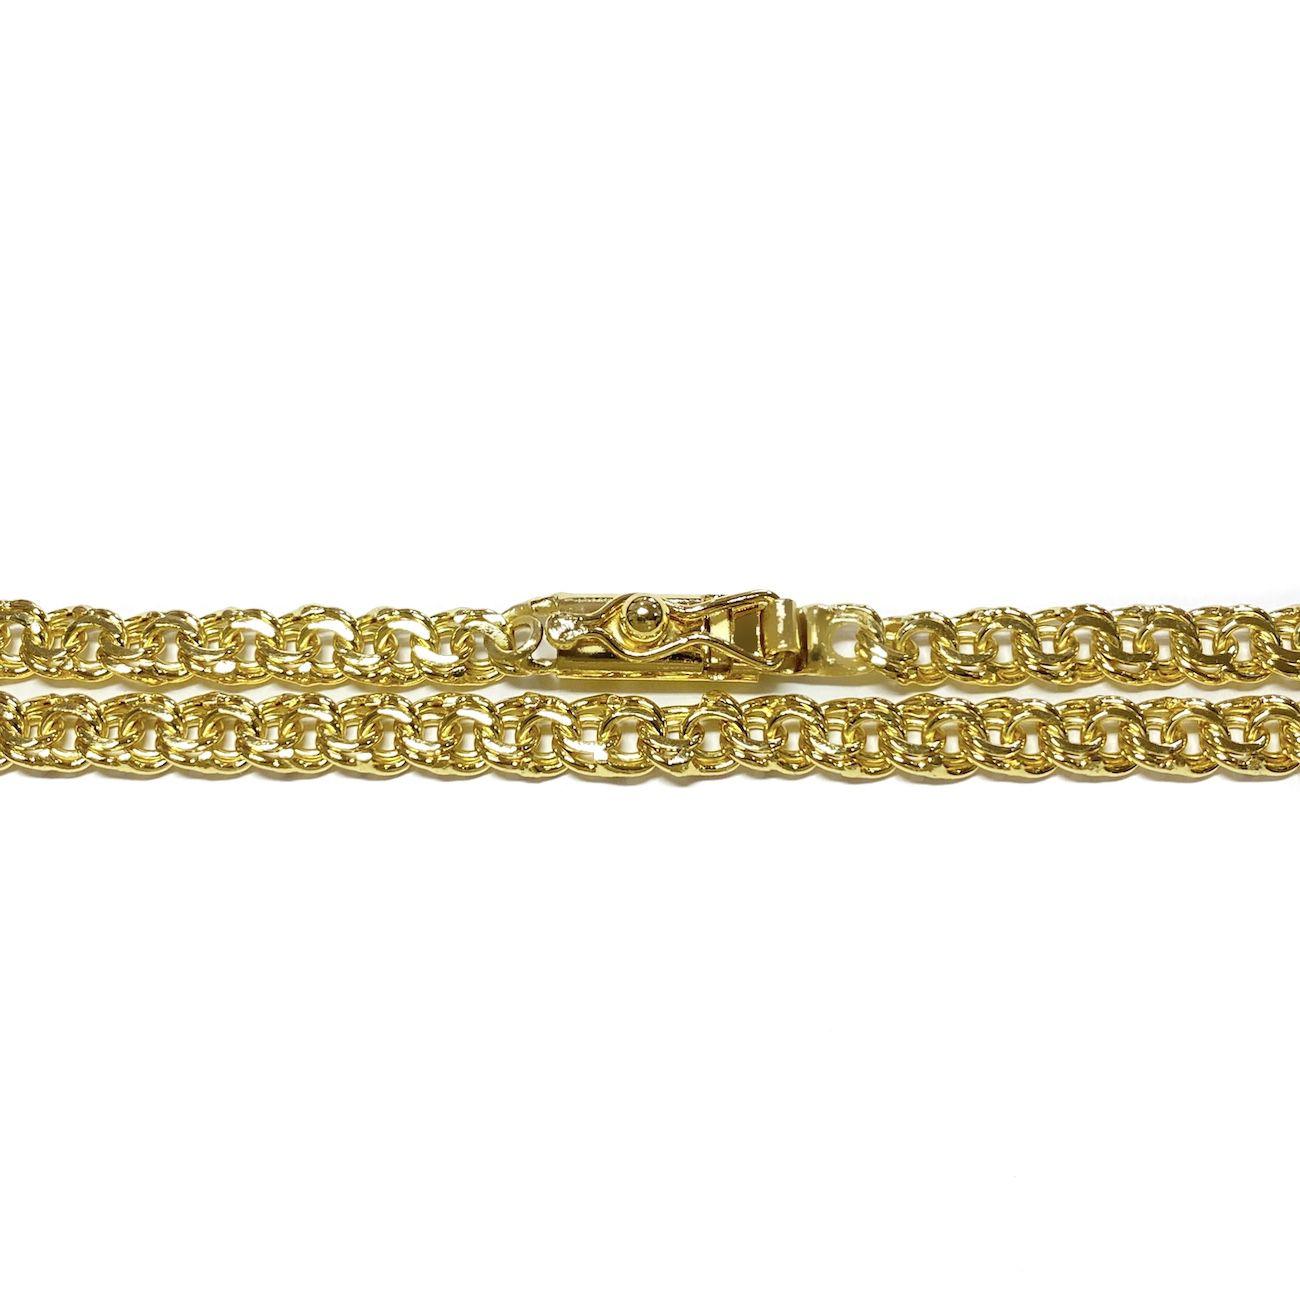 Corrente Friso 5,5mm 70cm 28g (Fecho Gaveta Frontal) (Banho Ouro 18K)